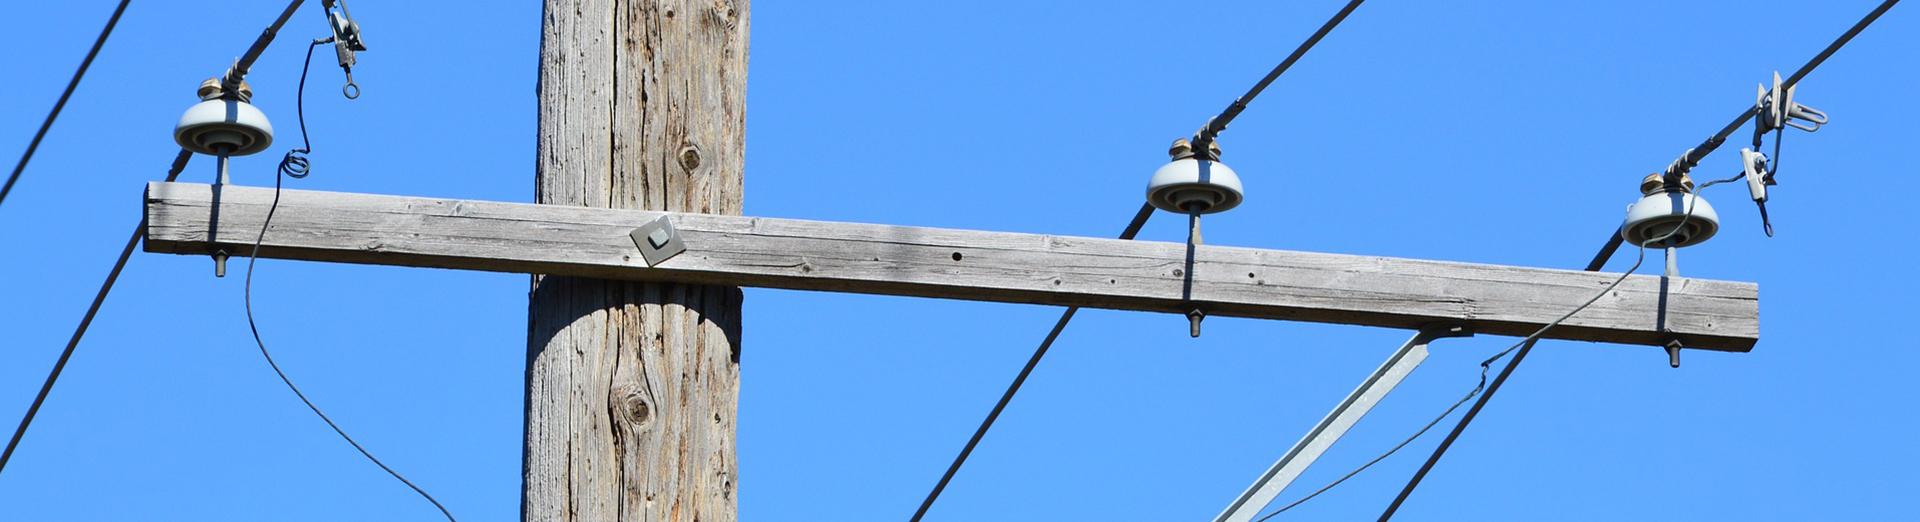 Public Works & Utilities | Lake City